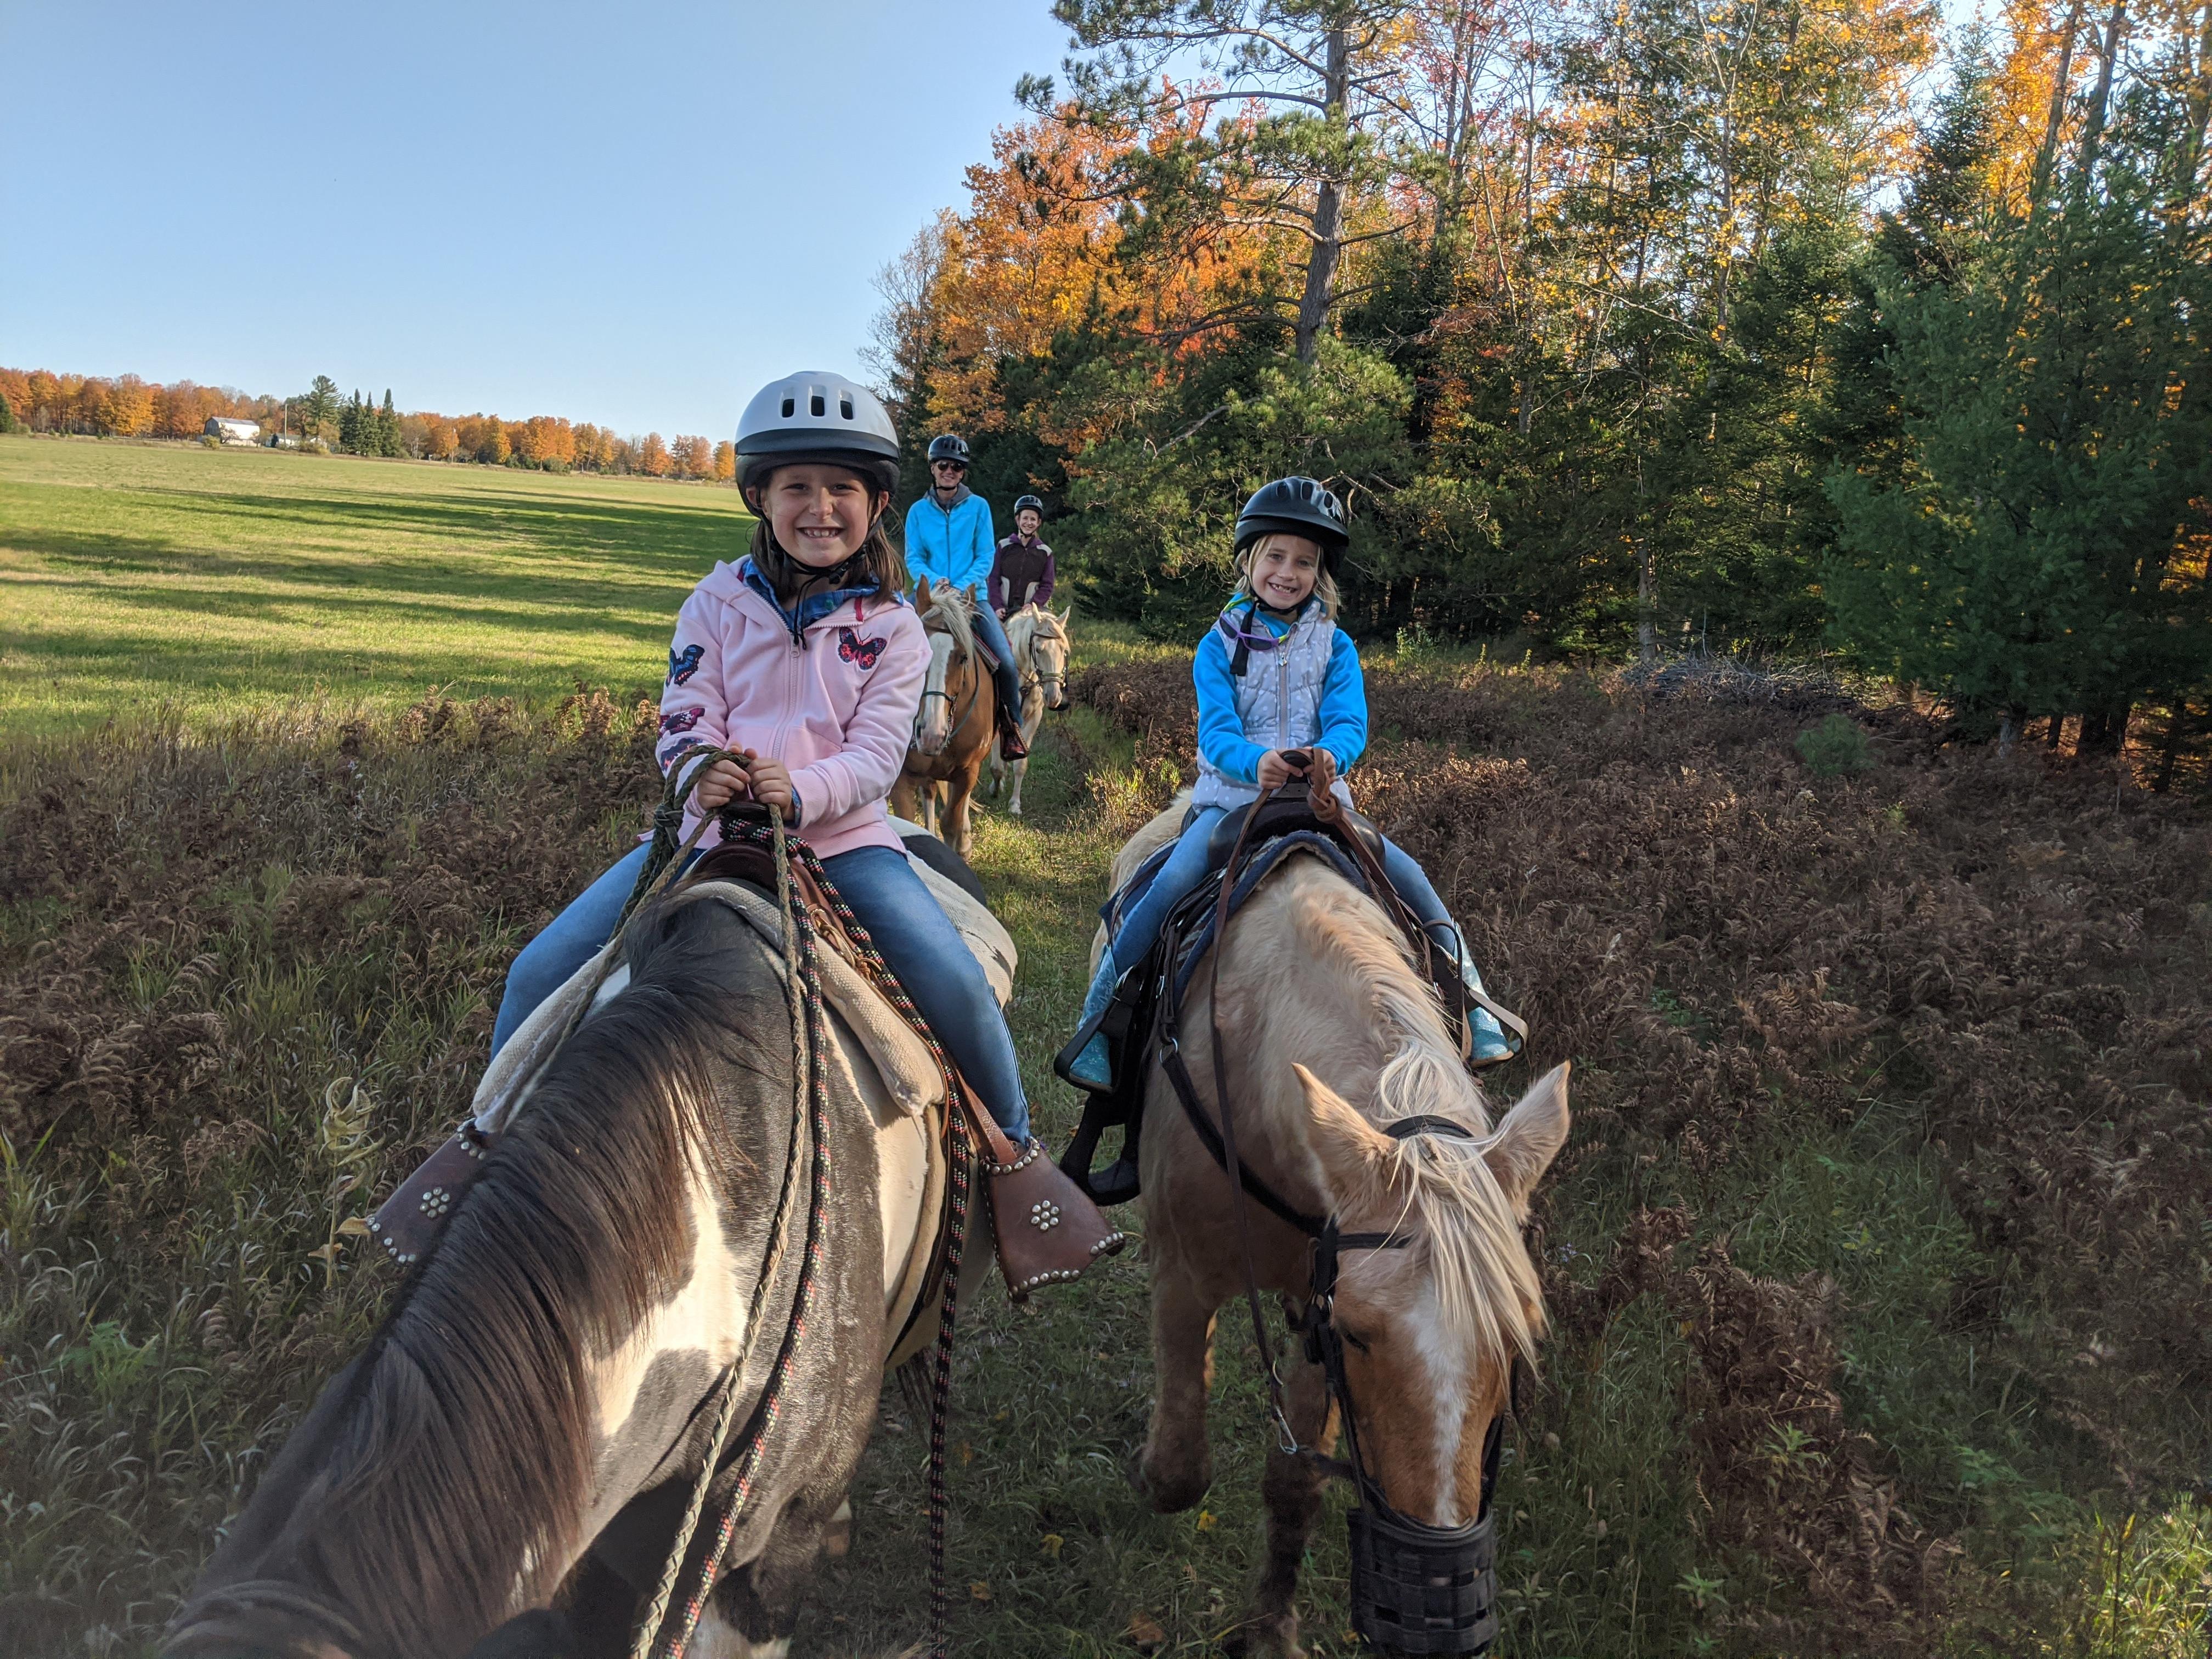 Kids' Ride